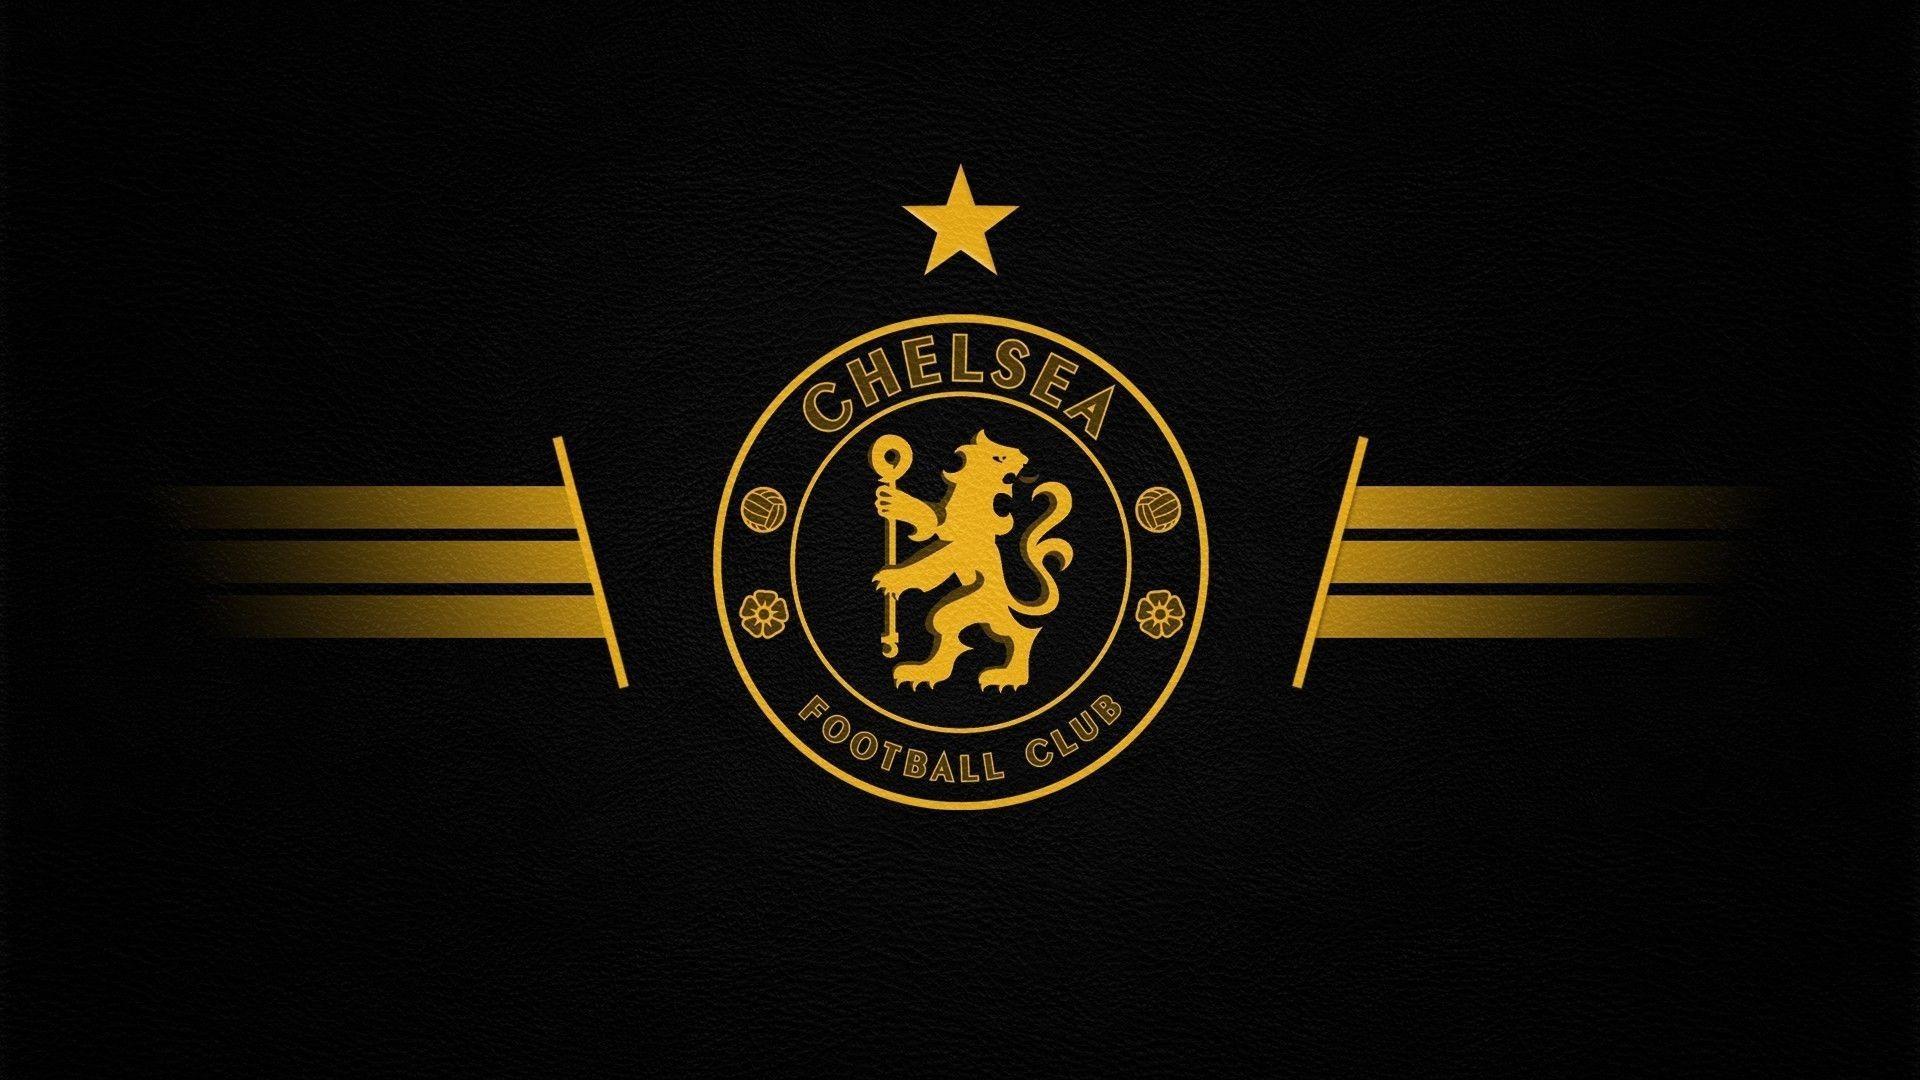 1280x1024px Chelsea Fc Wallpaper Logo